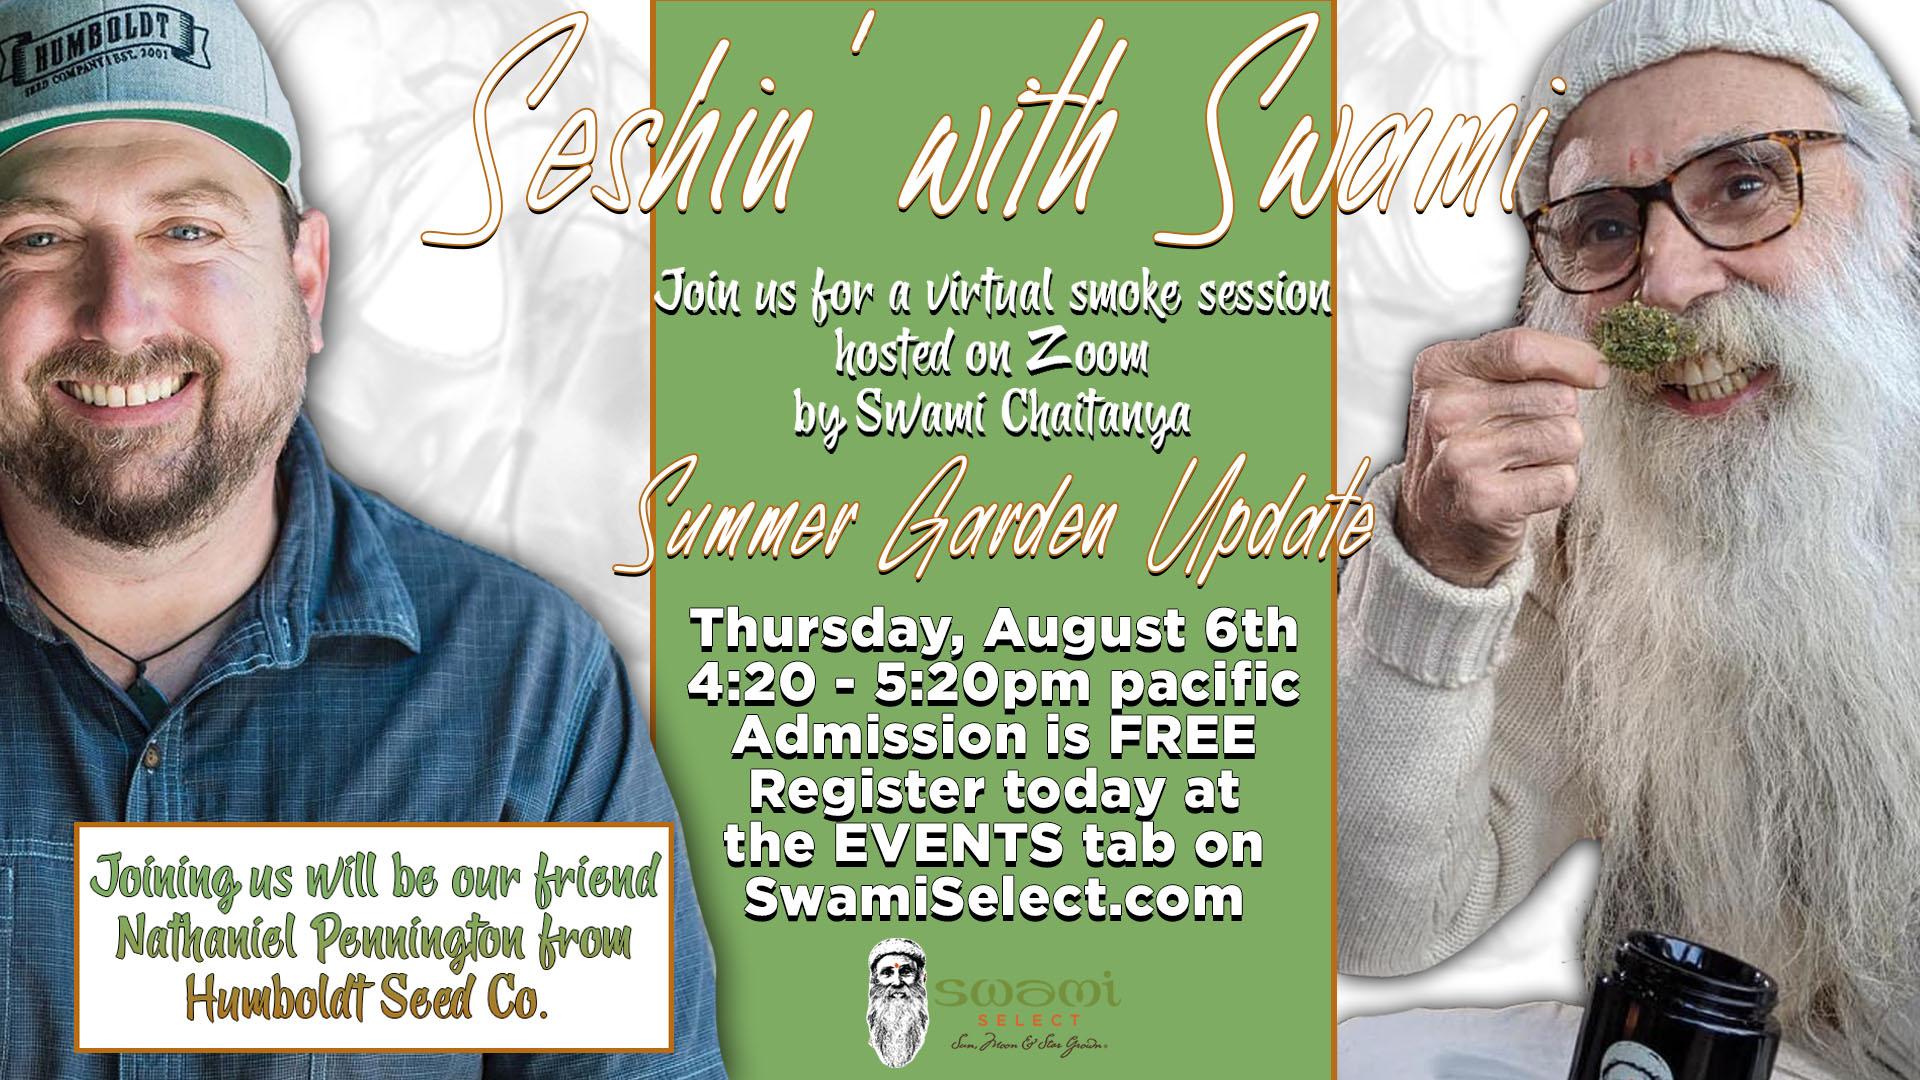 Seshin' with Swami - Virtual Smoke Sesh with Nat Pennington of the Humboldt Seed Co.